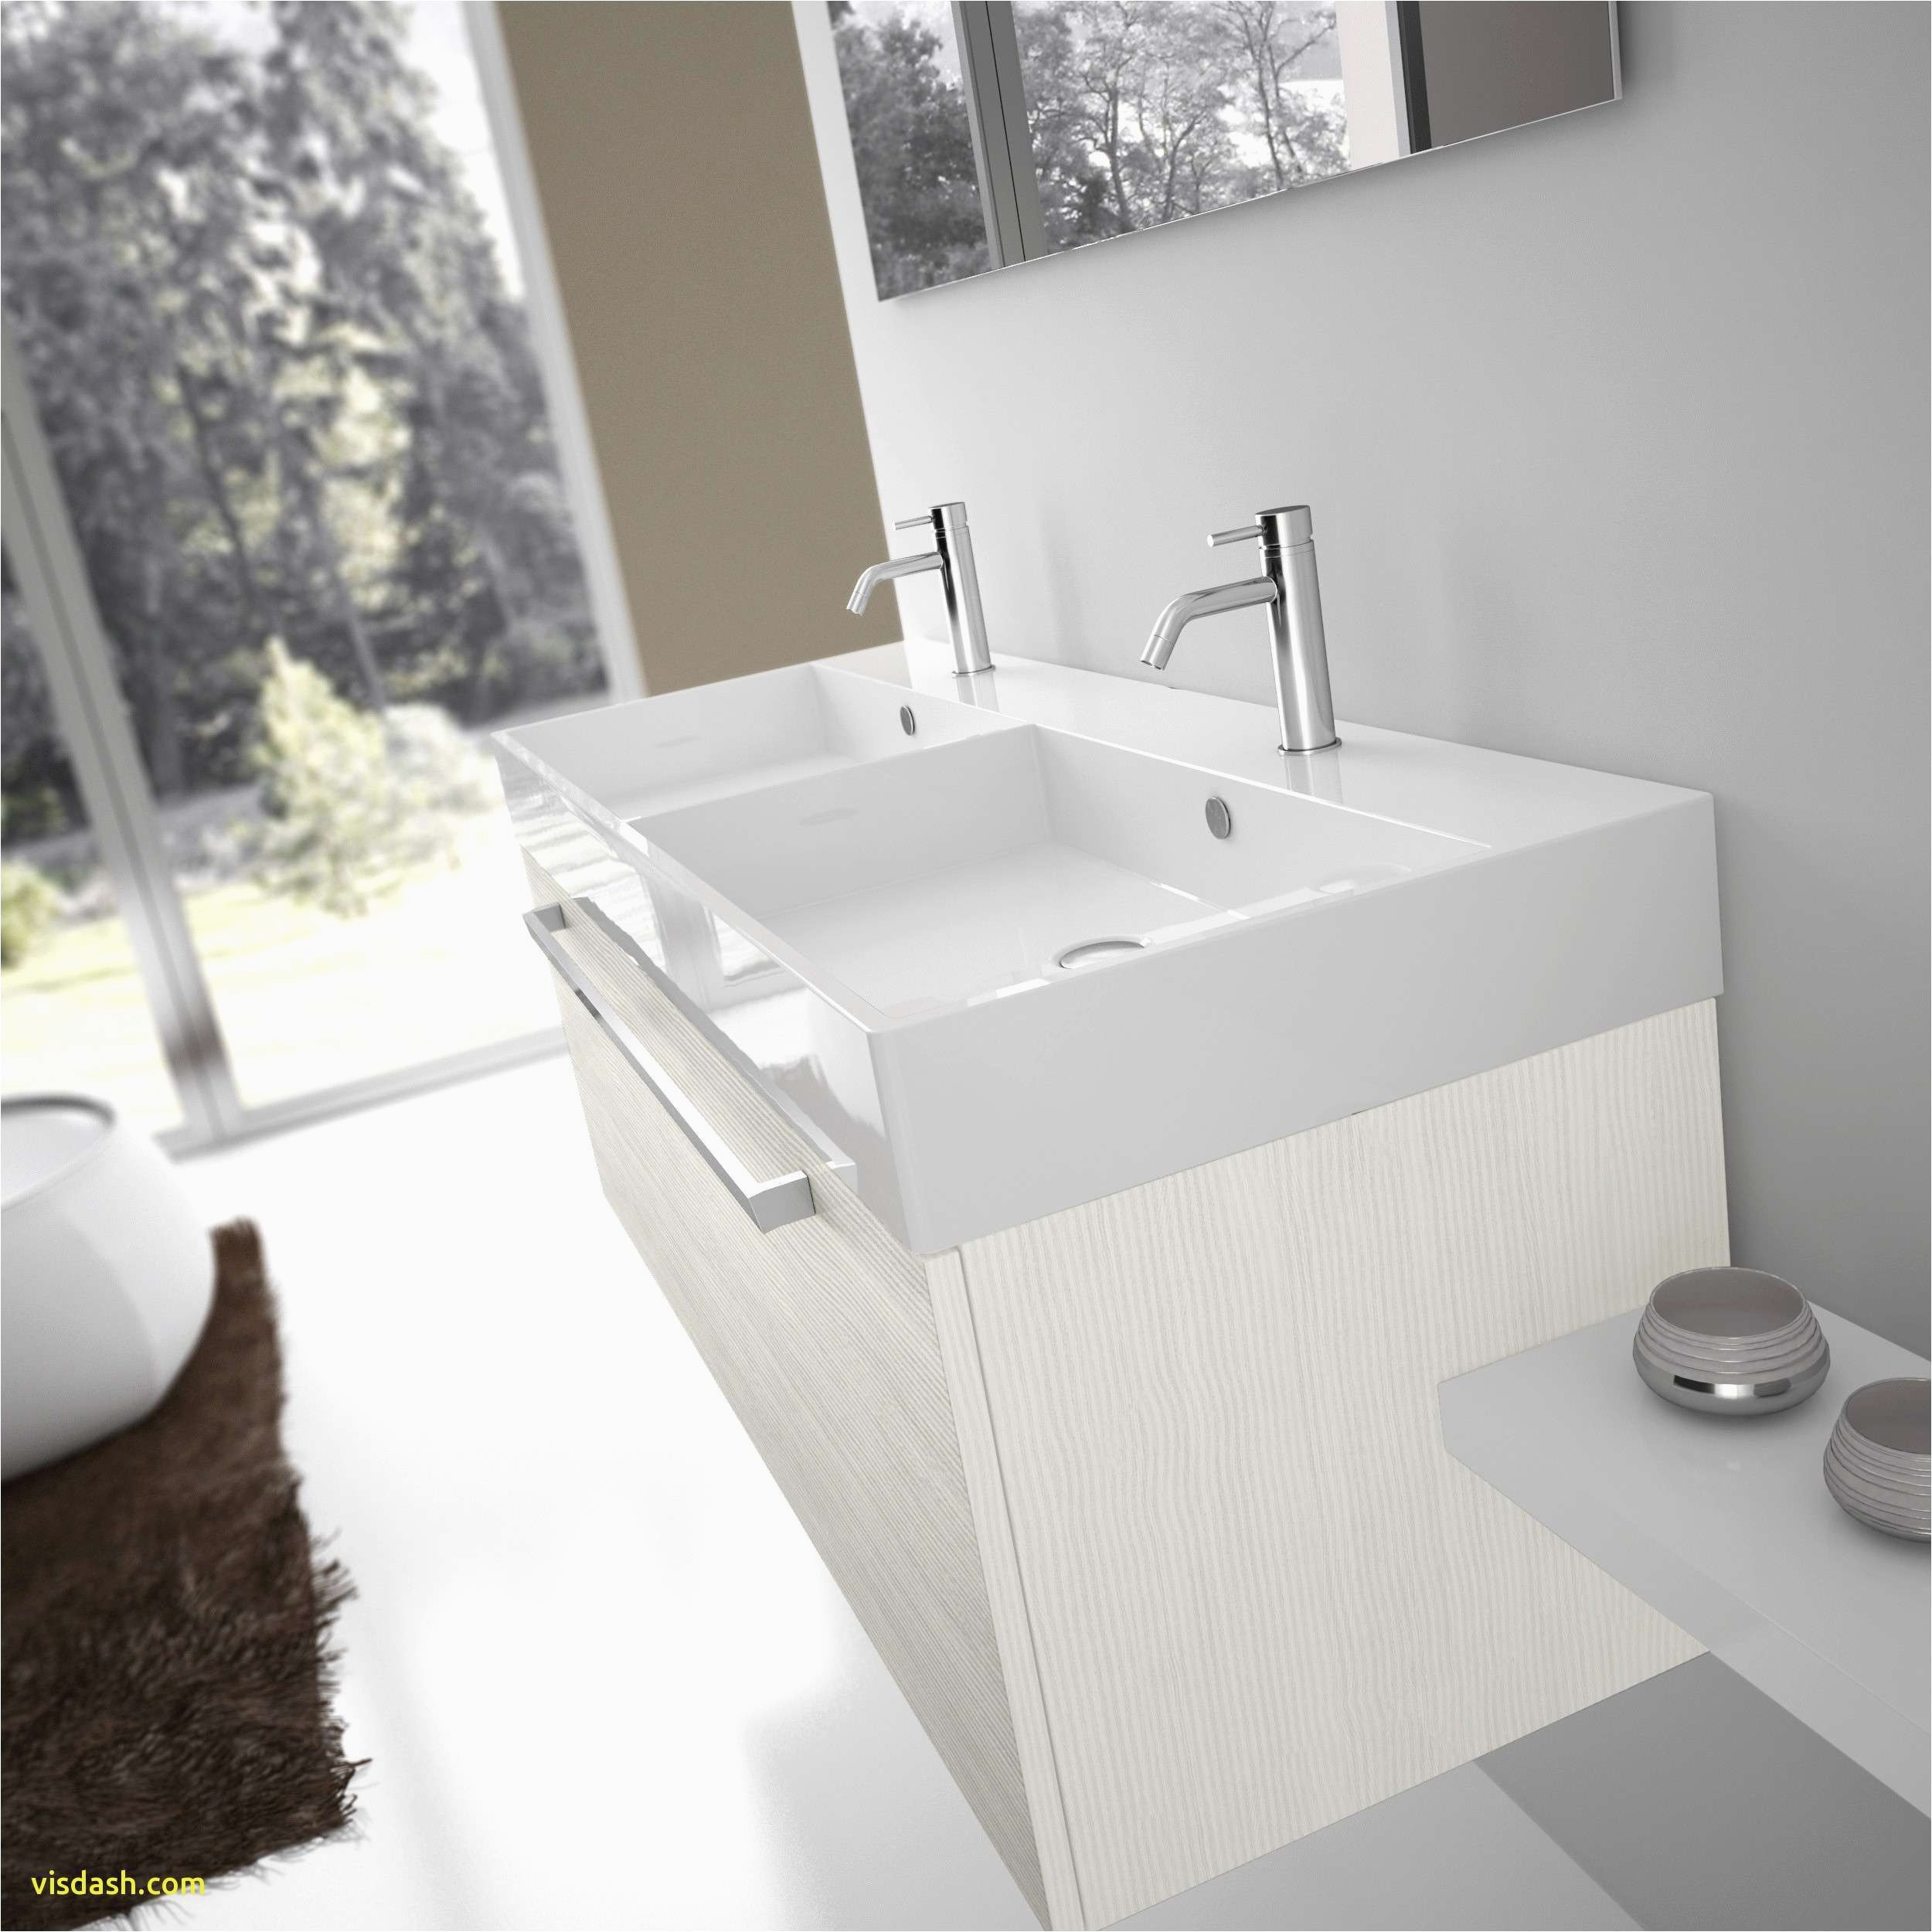 Bathroom Sink Designs Custom Bathroom Sinks Gallery H Sink New Bathroom I 0d Inspiring